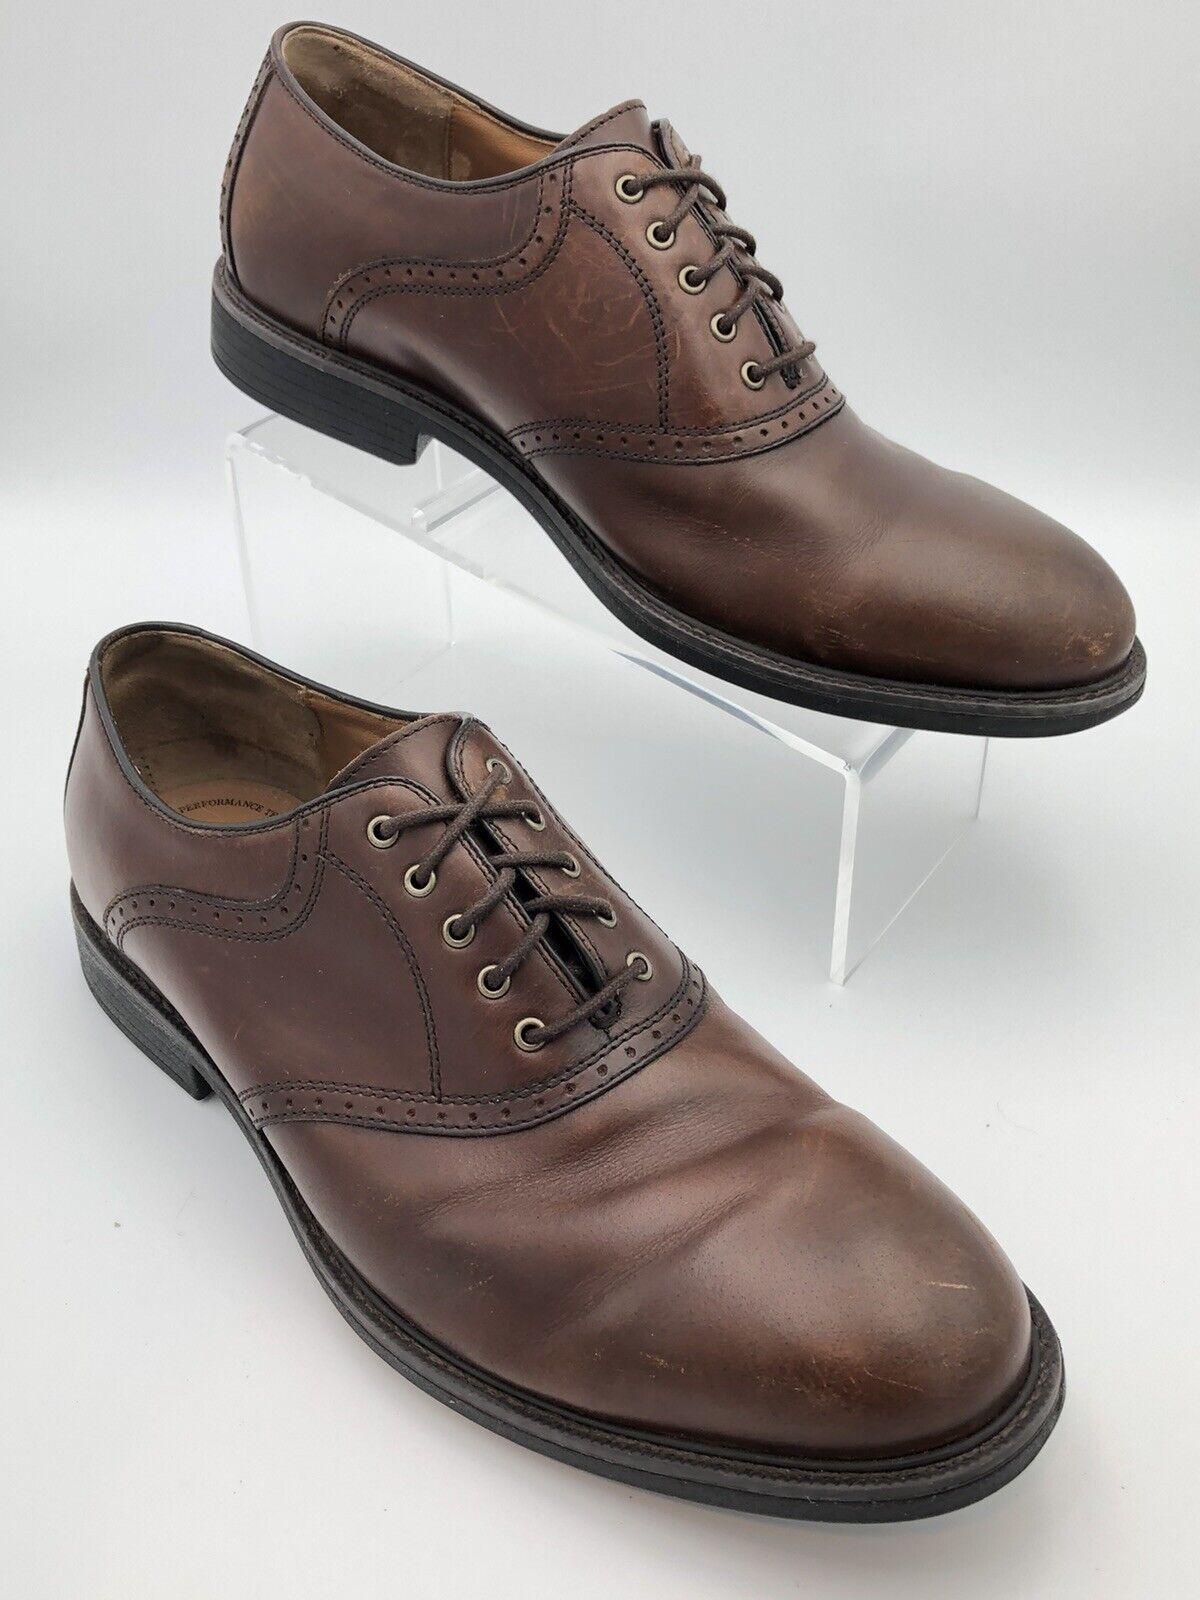 JOHNSTON & MURPHY XC4 Waterproof Brown Sheepskin Oxford Dual Width Shoes Sz 11 M